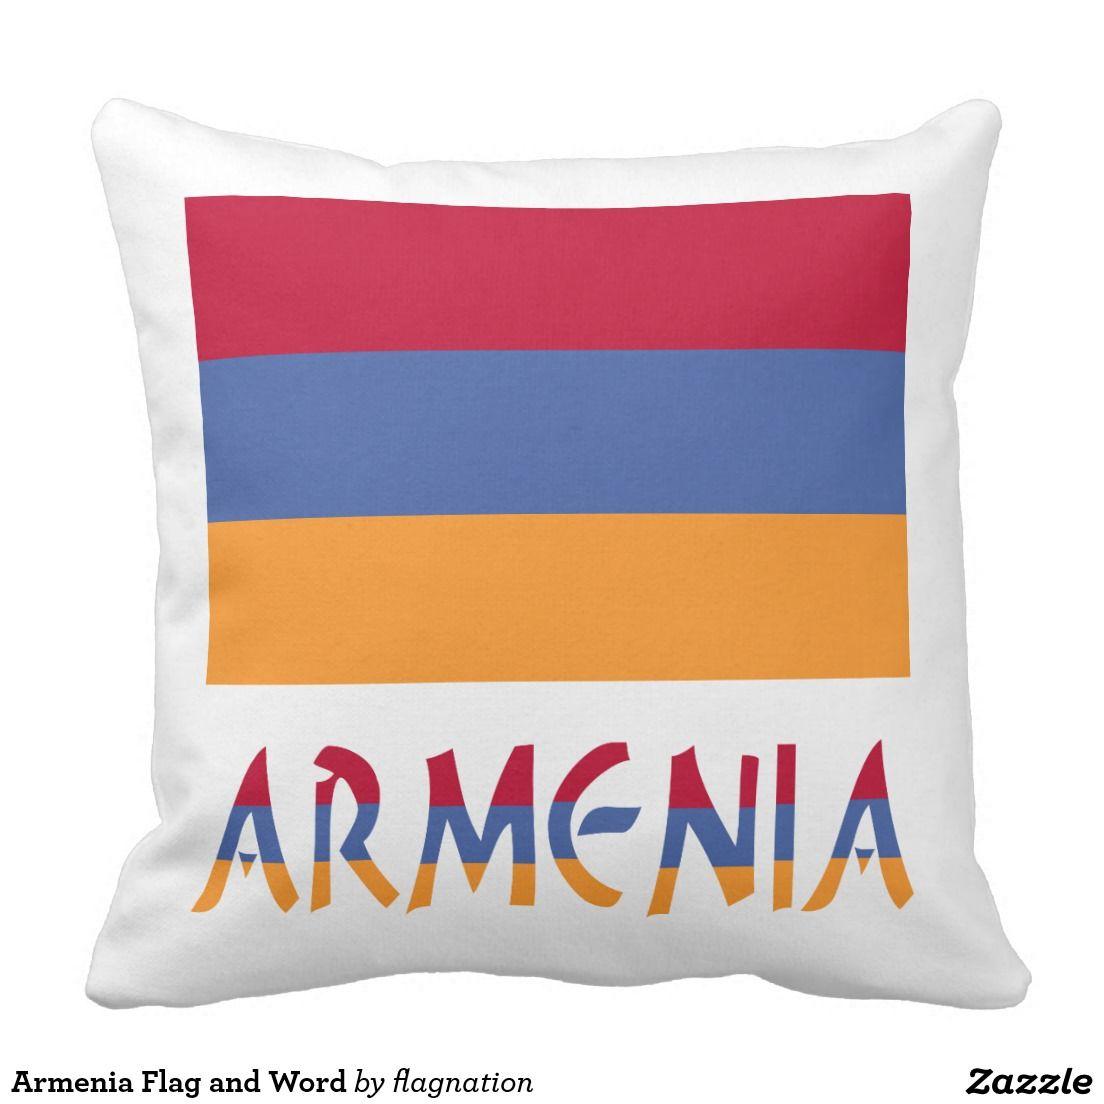 Armenian Flag and Armenia Throw Pillow auntieshoe created this